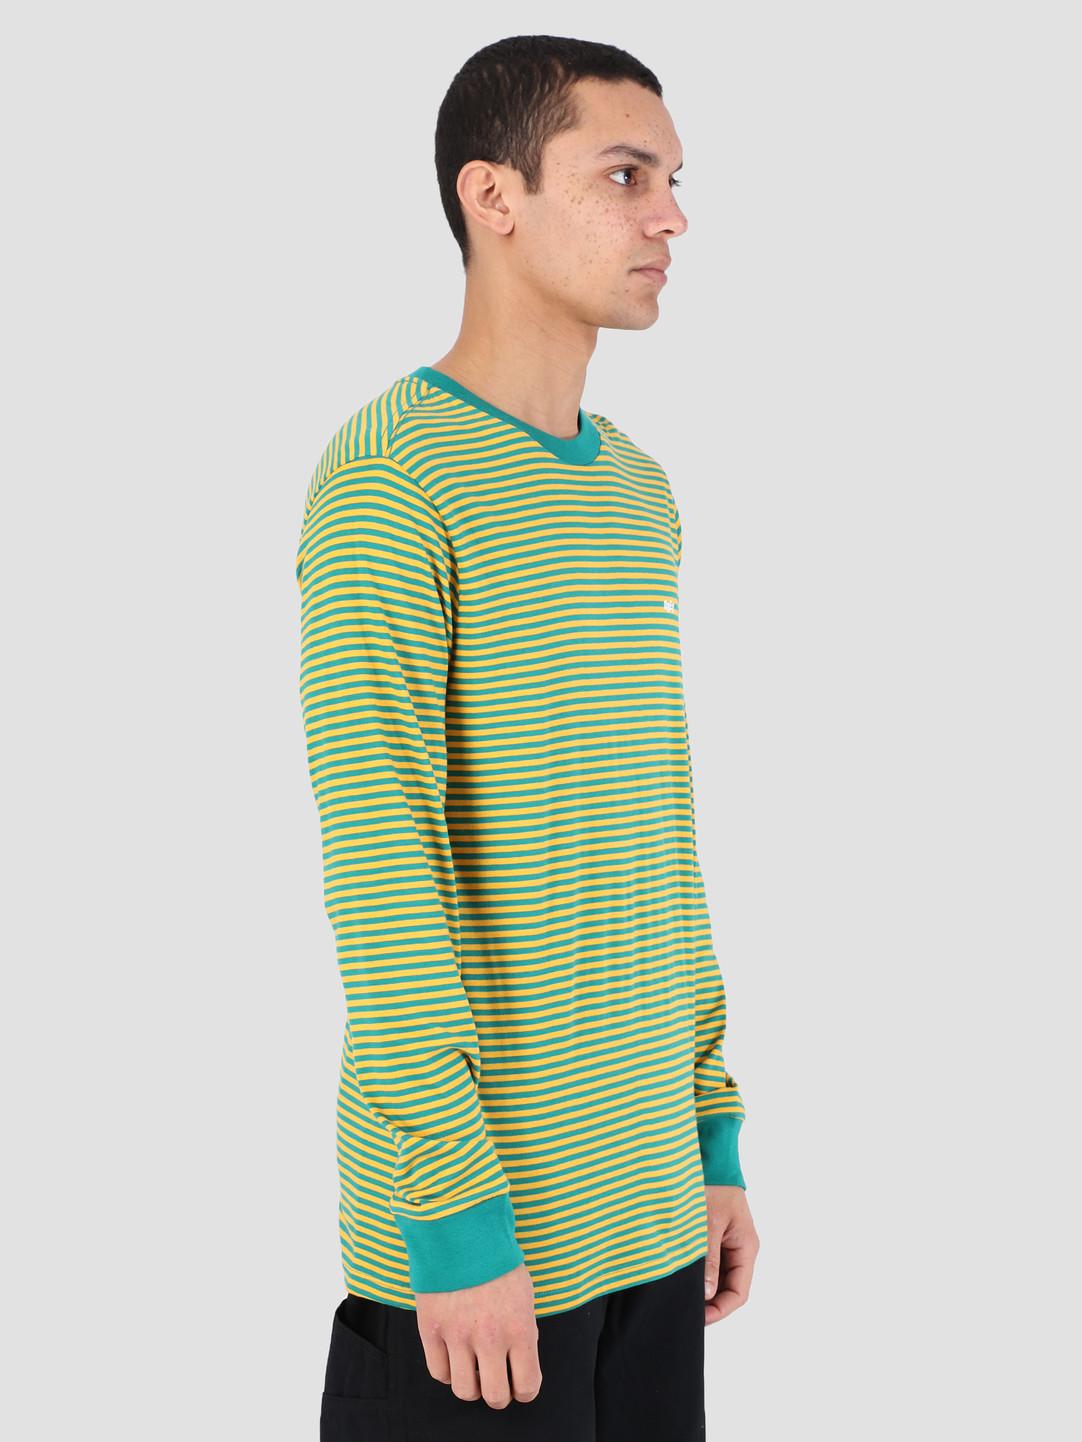 Obey Obey Apex T-Shirt Longsleeve BGM 131030068